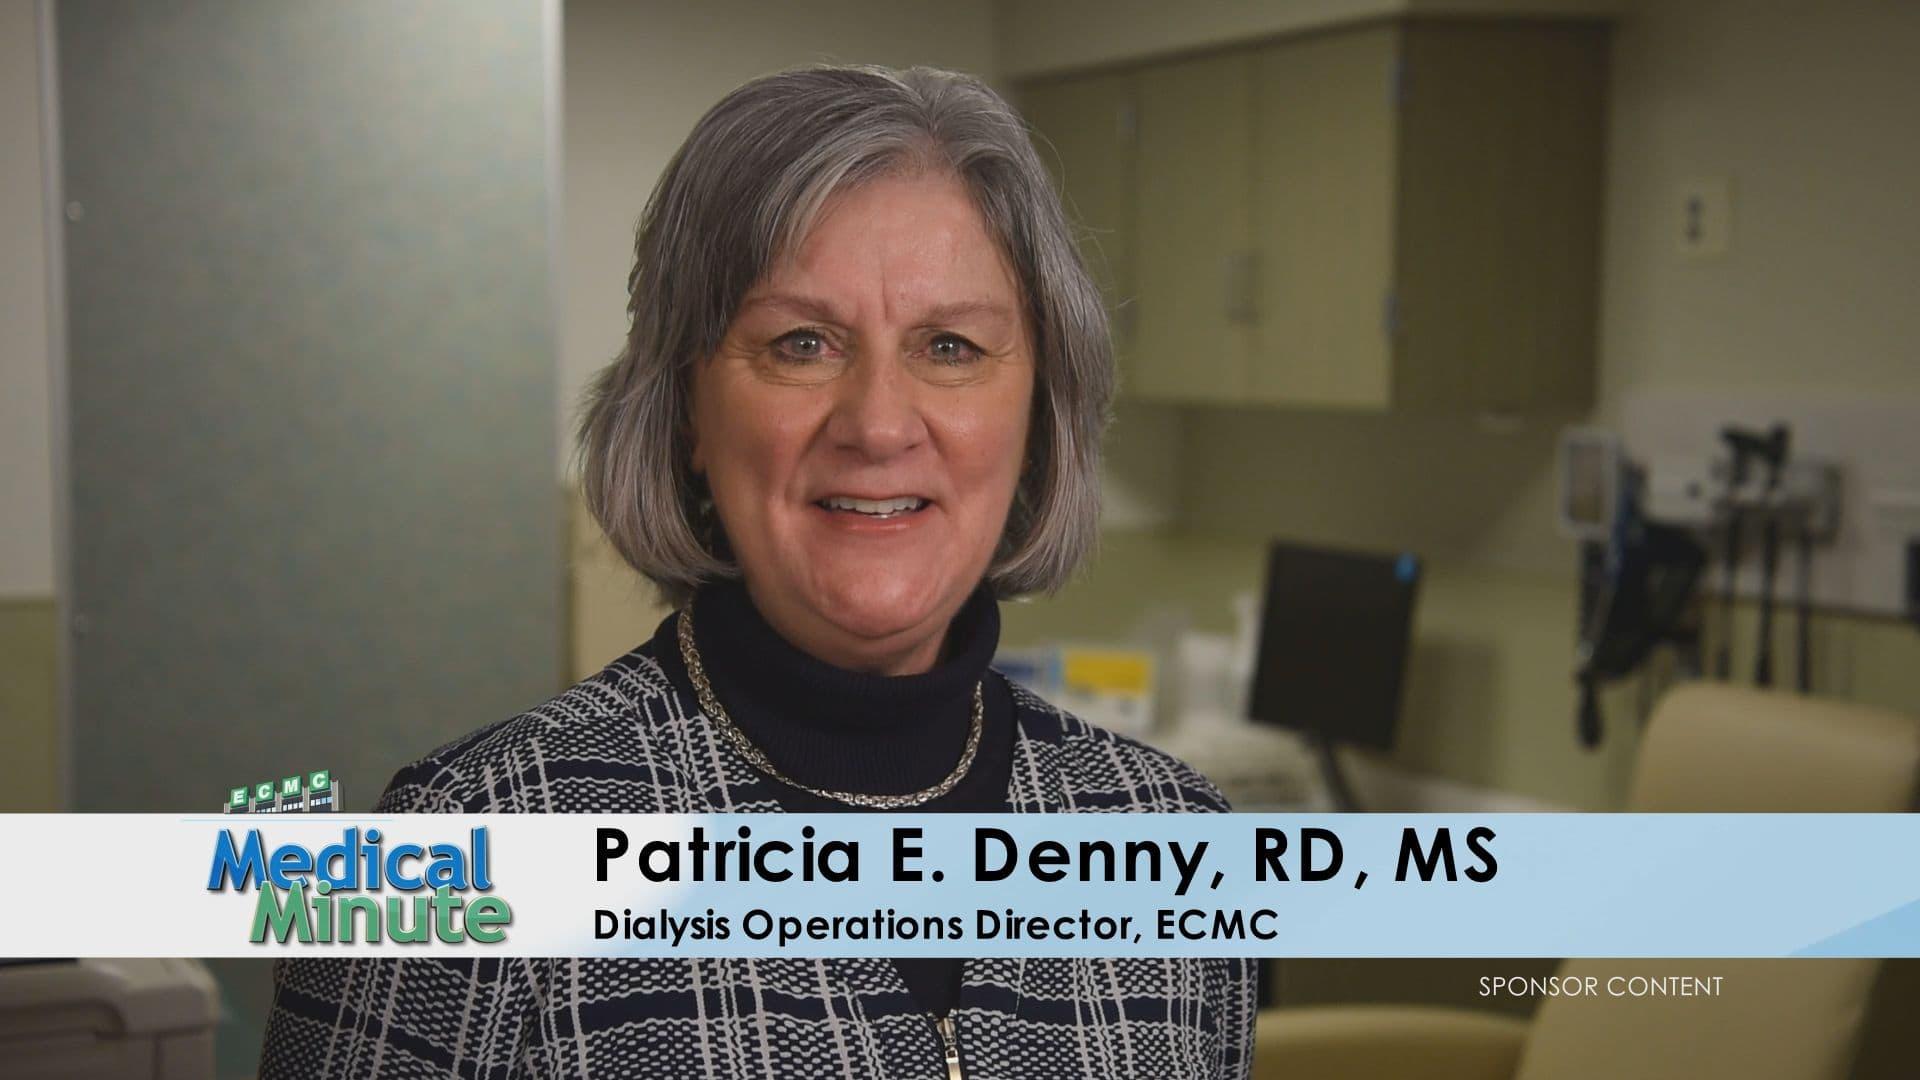 ECMCMedicalMinute PatriciaDenny,RD,MS KidneyDiseasePatientEducationSessions 012720 STILL